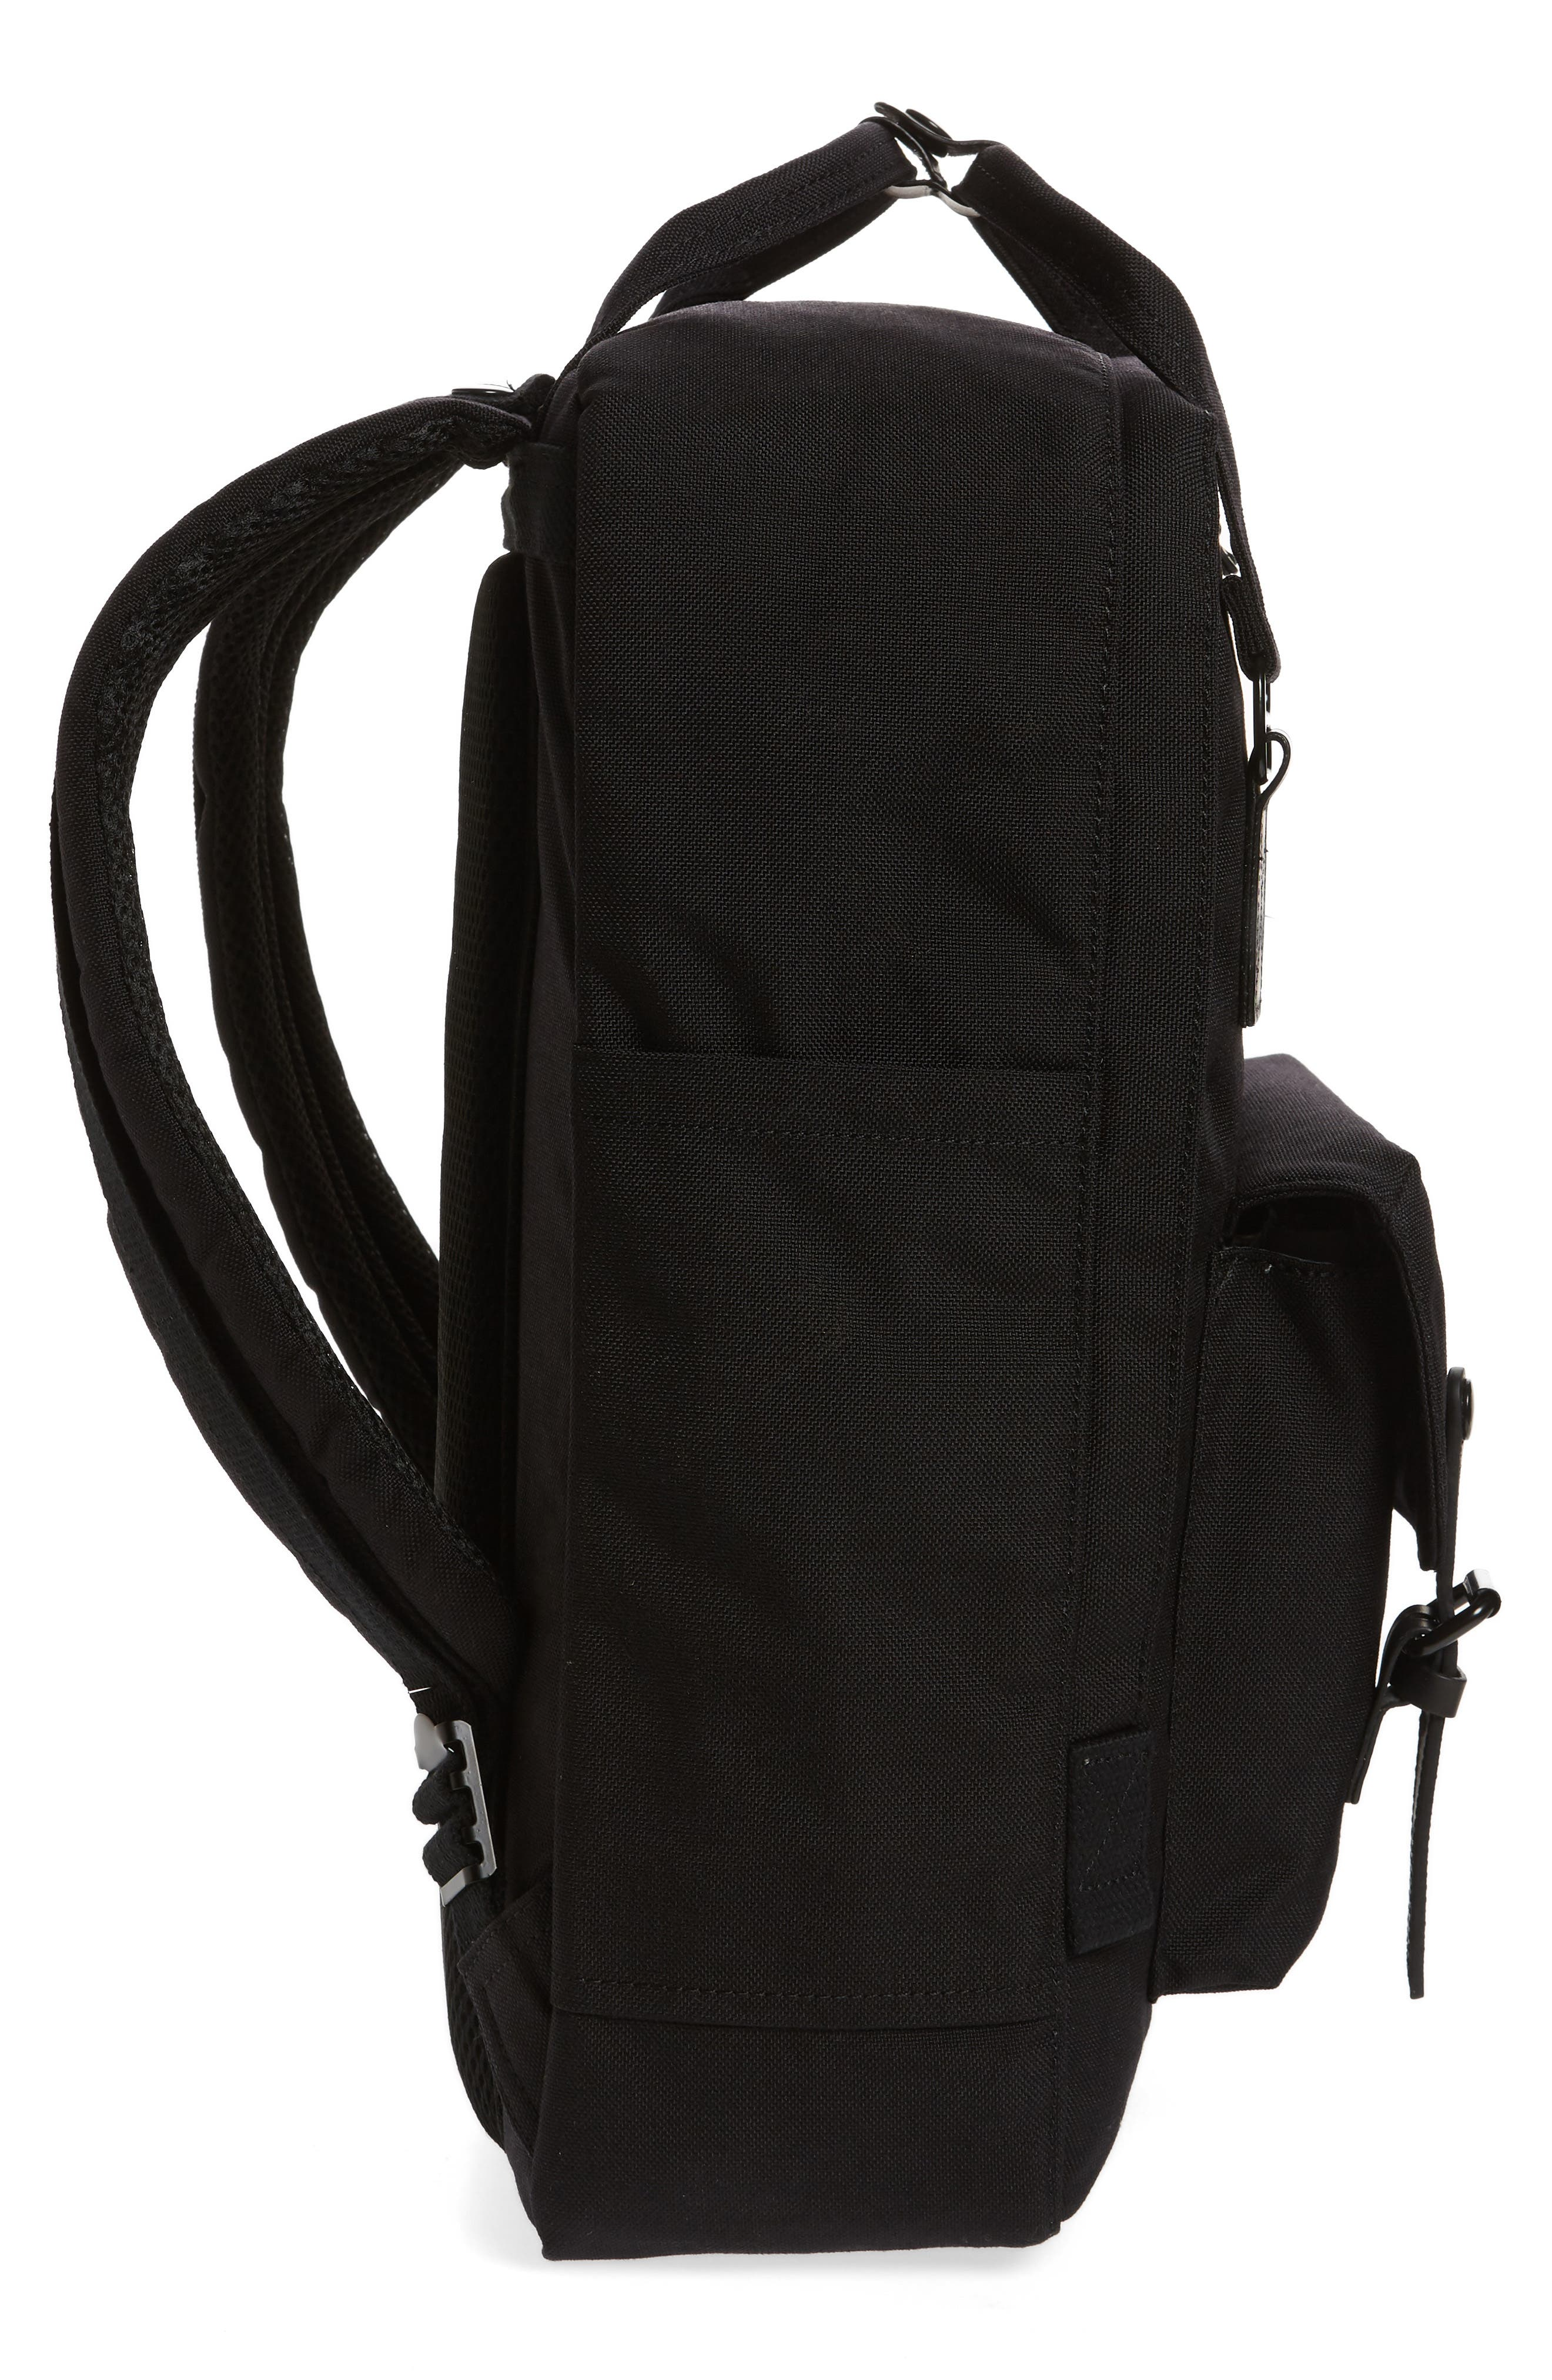 Macaroon Large Cordura<sup>®</sup> Black Series Water Repellent Backpack,                             Alternate thumbnail 5, color,                             001